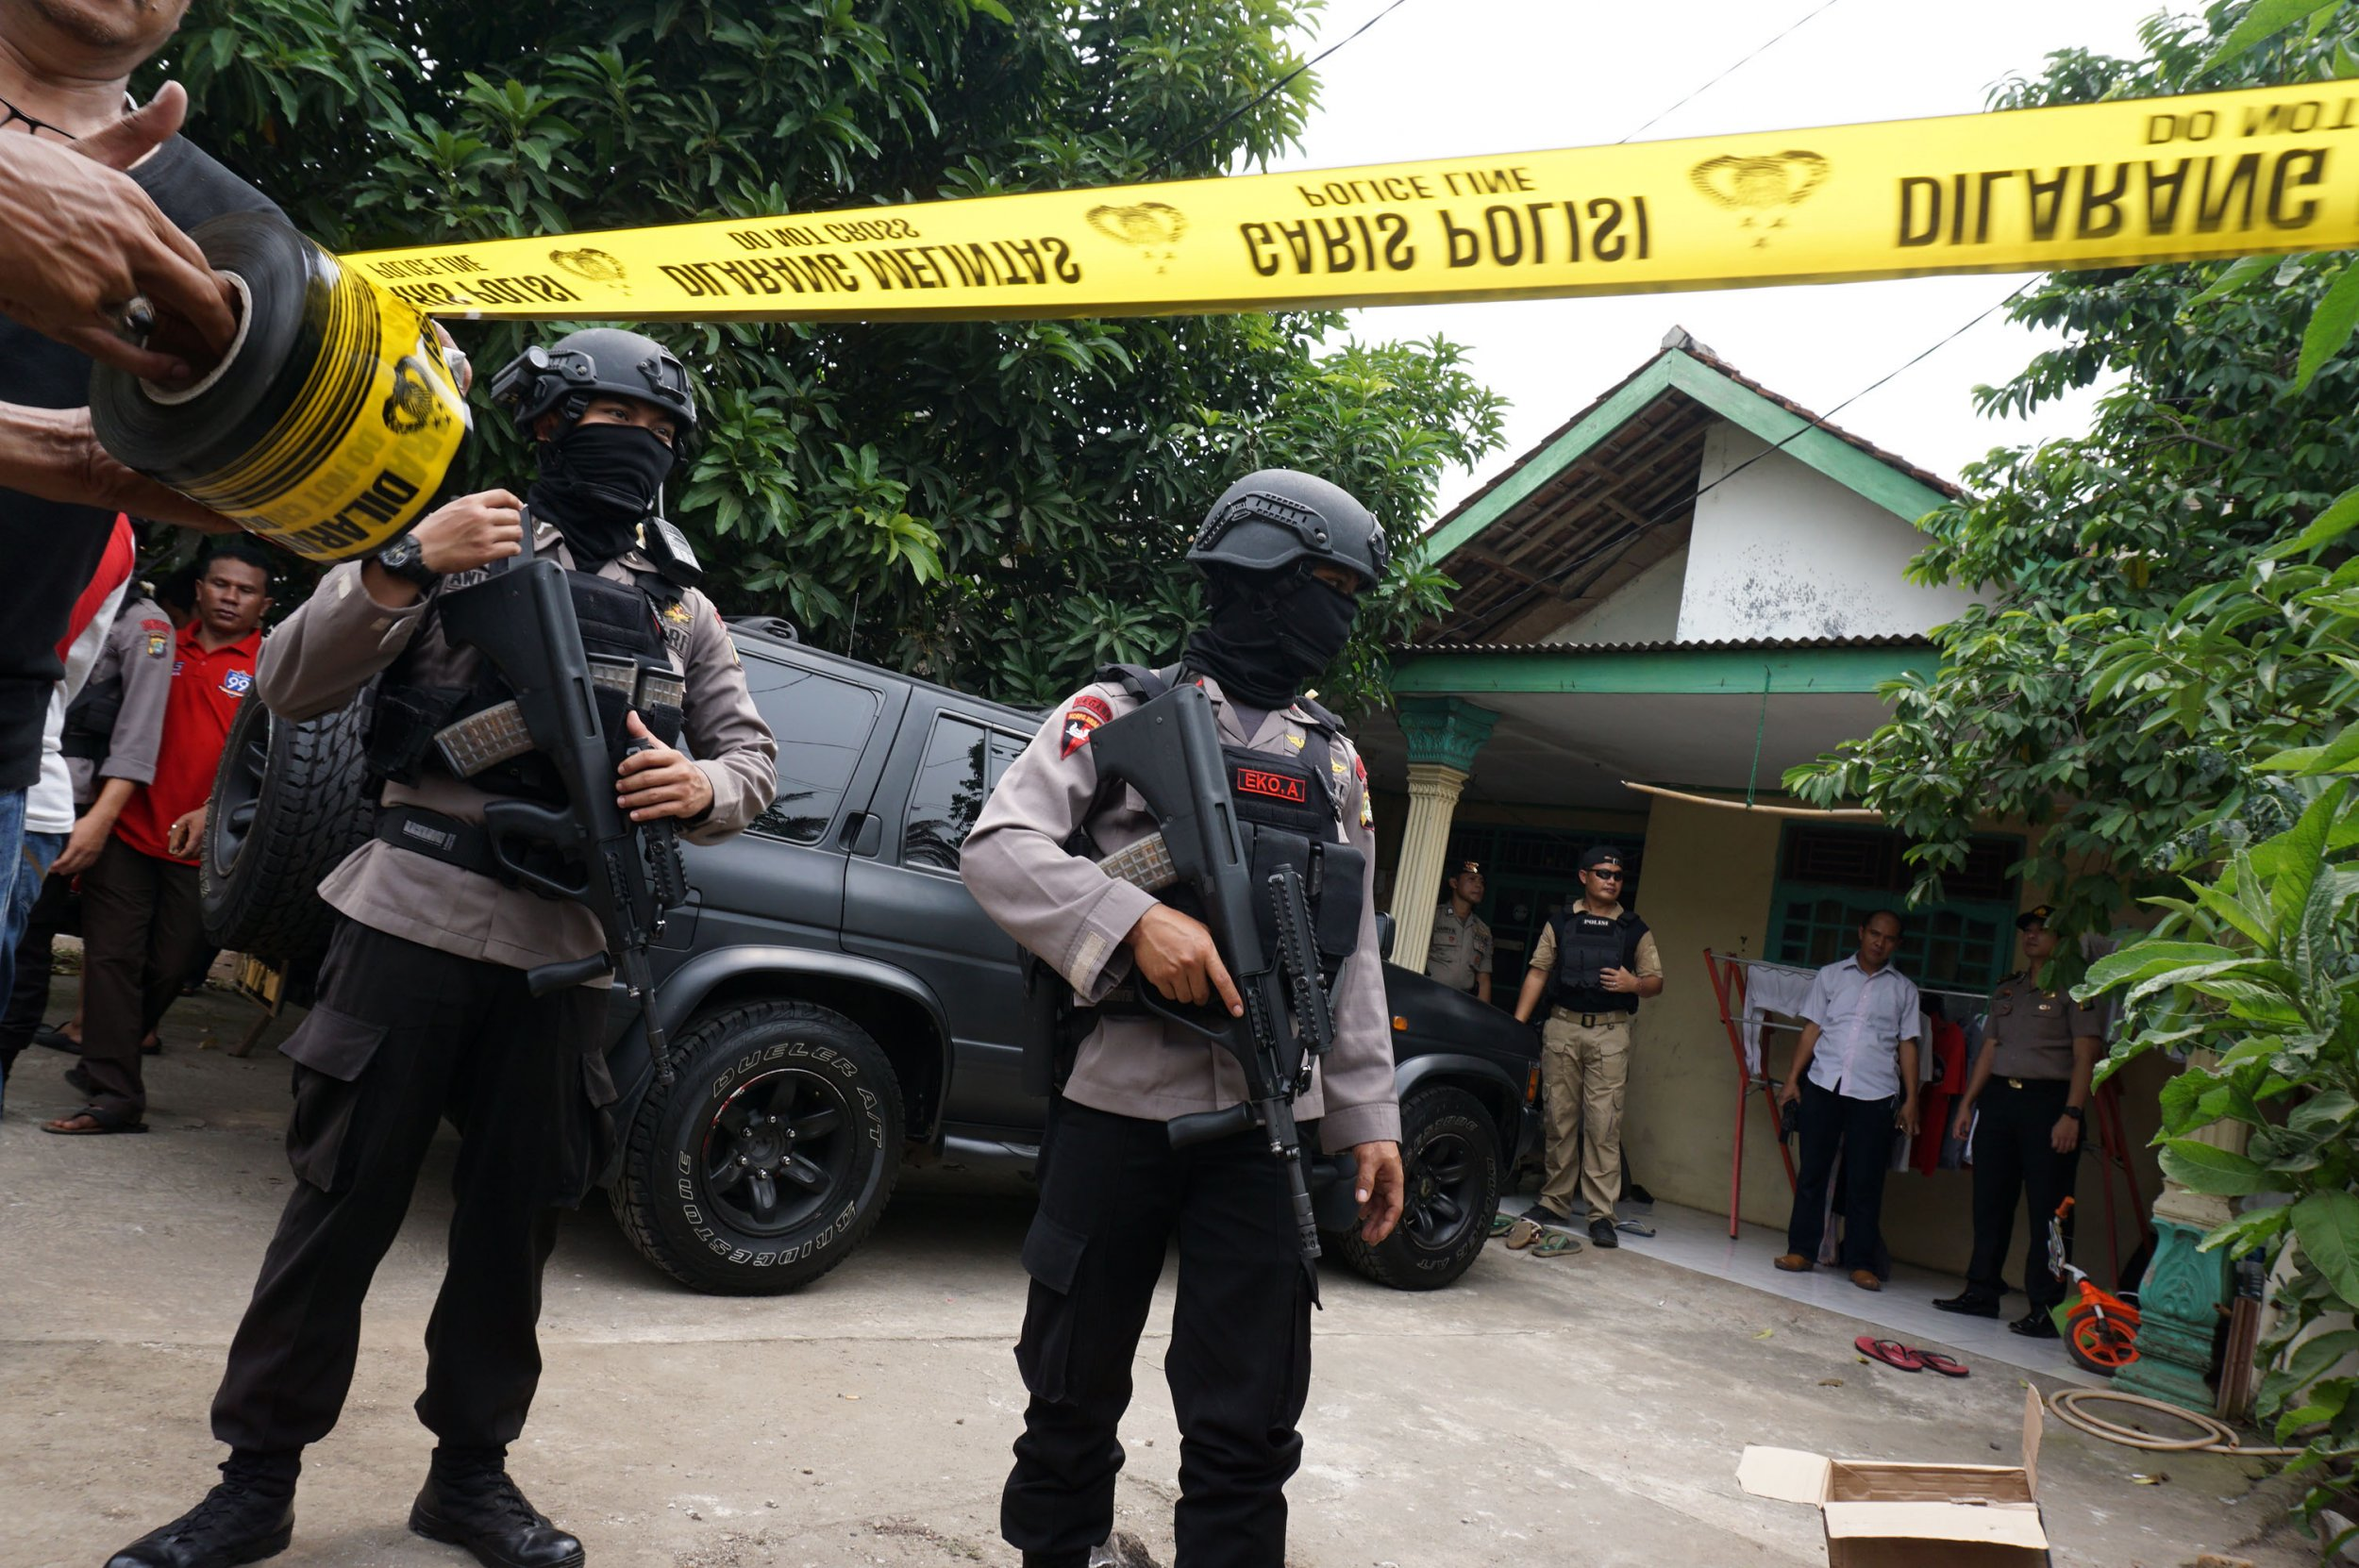 Indonesia Police